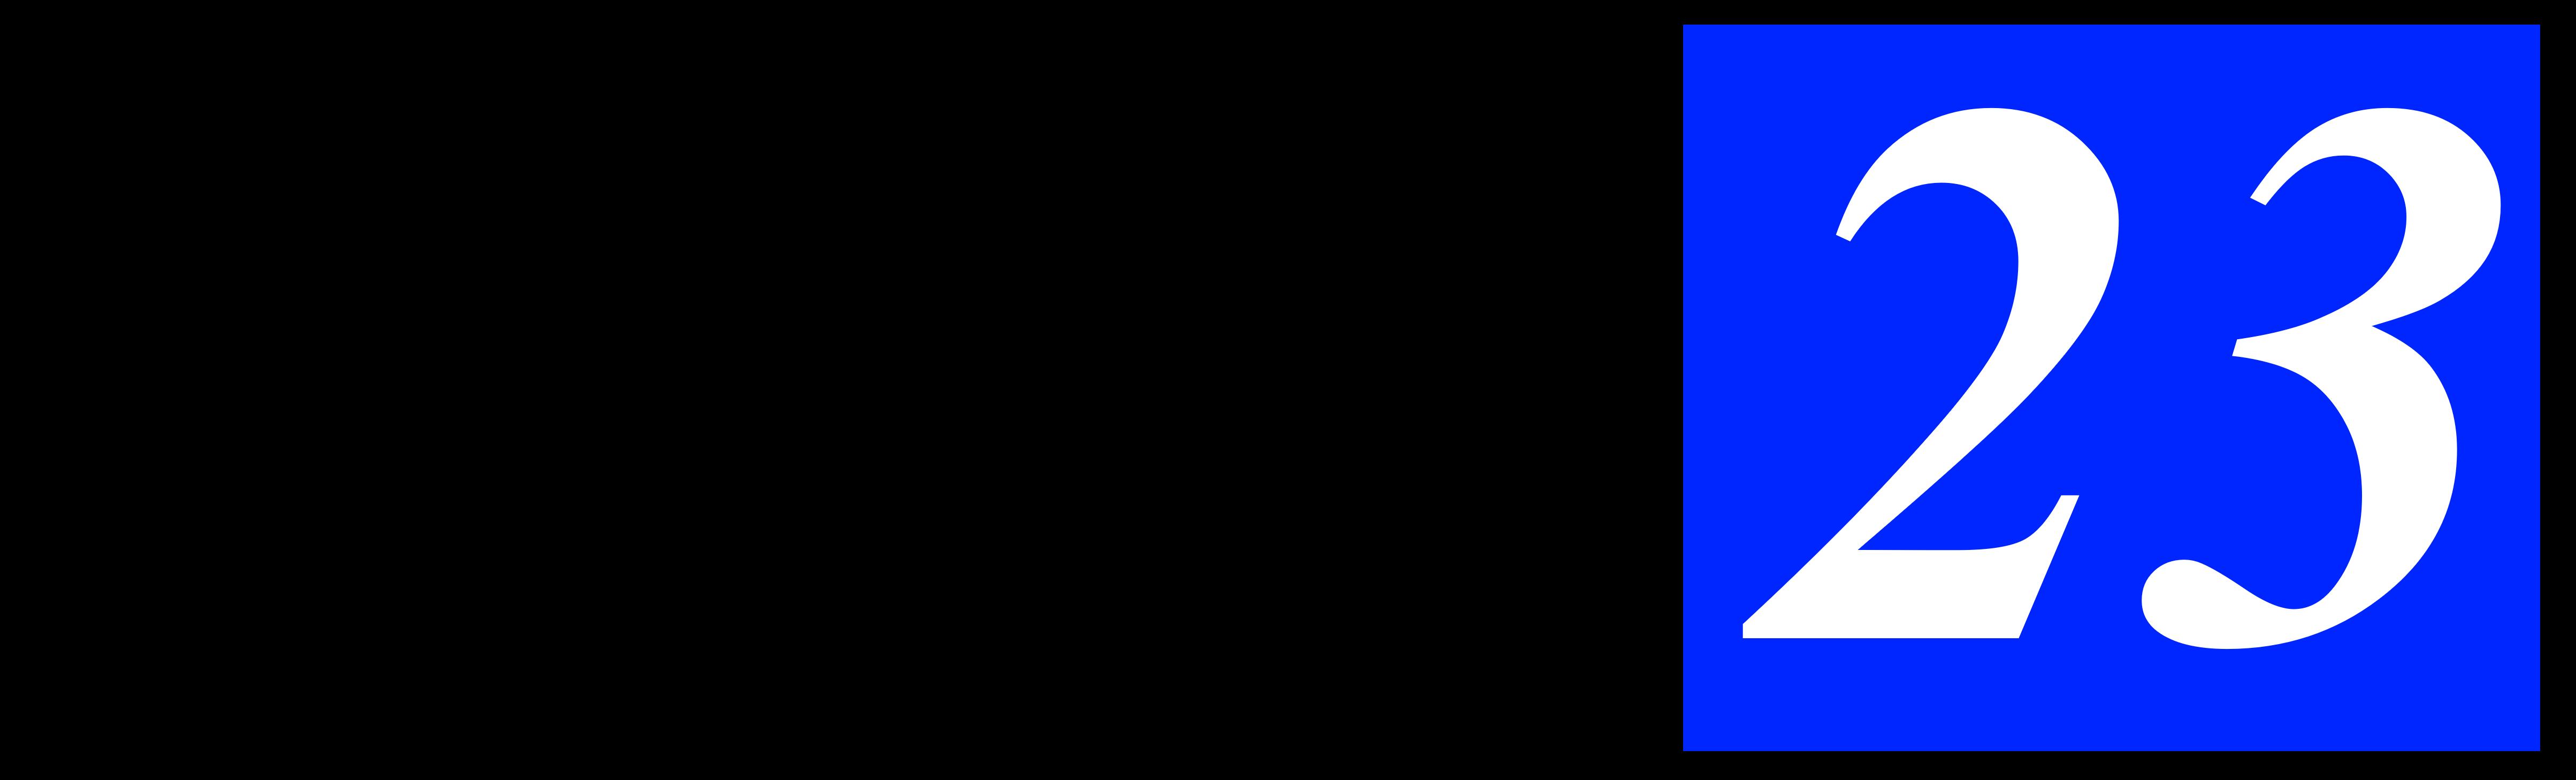 AlternateHistory.com's KERO logo #1.png